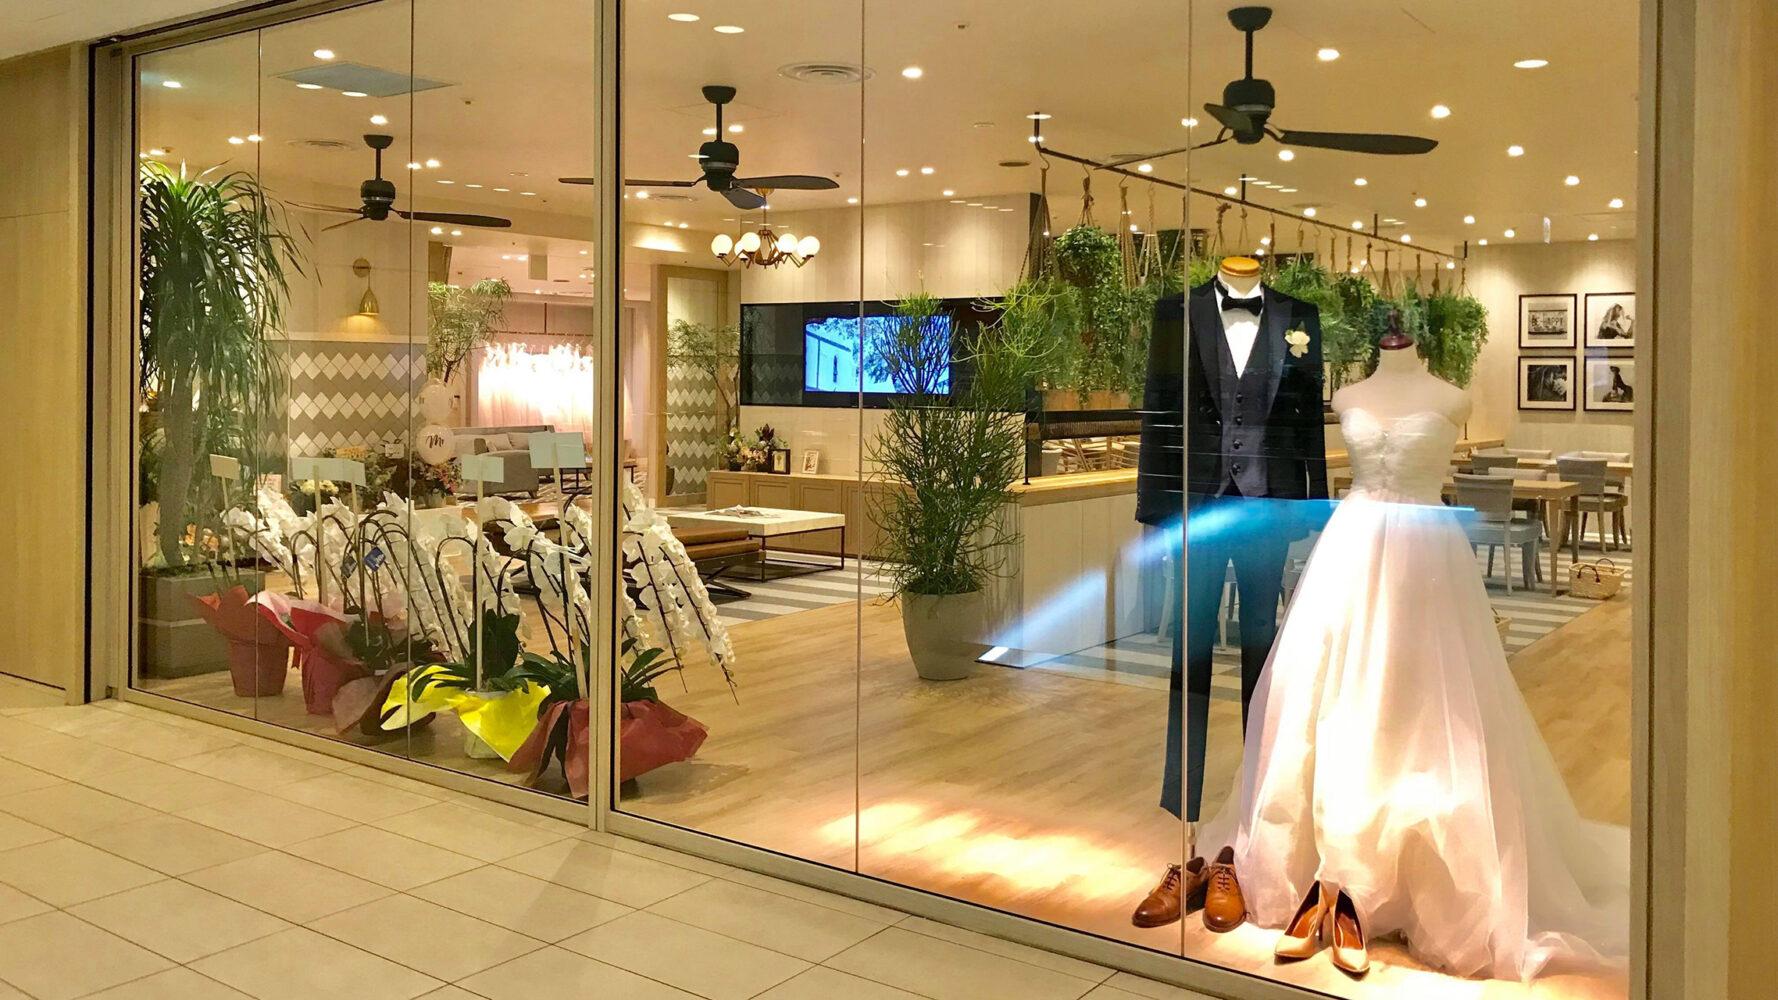 FIRST WEDDING 渋谷 事例画像3